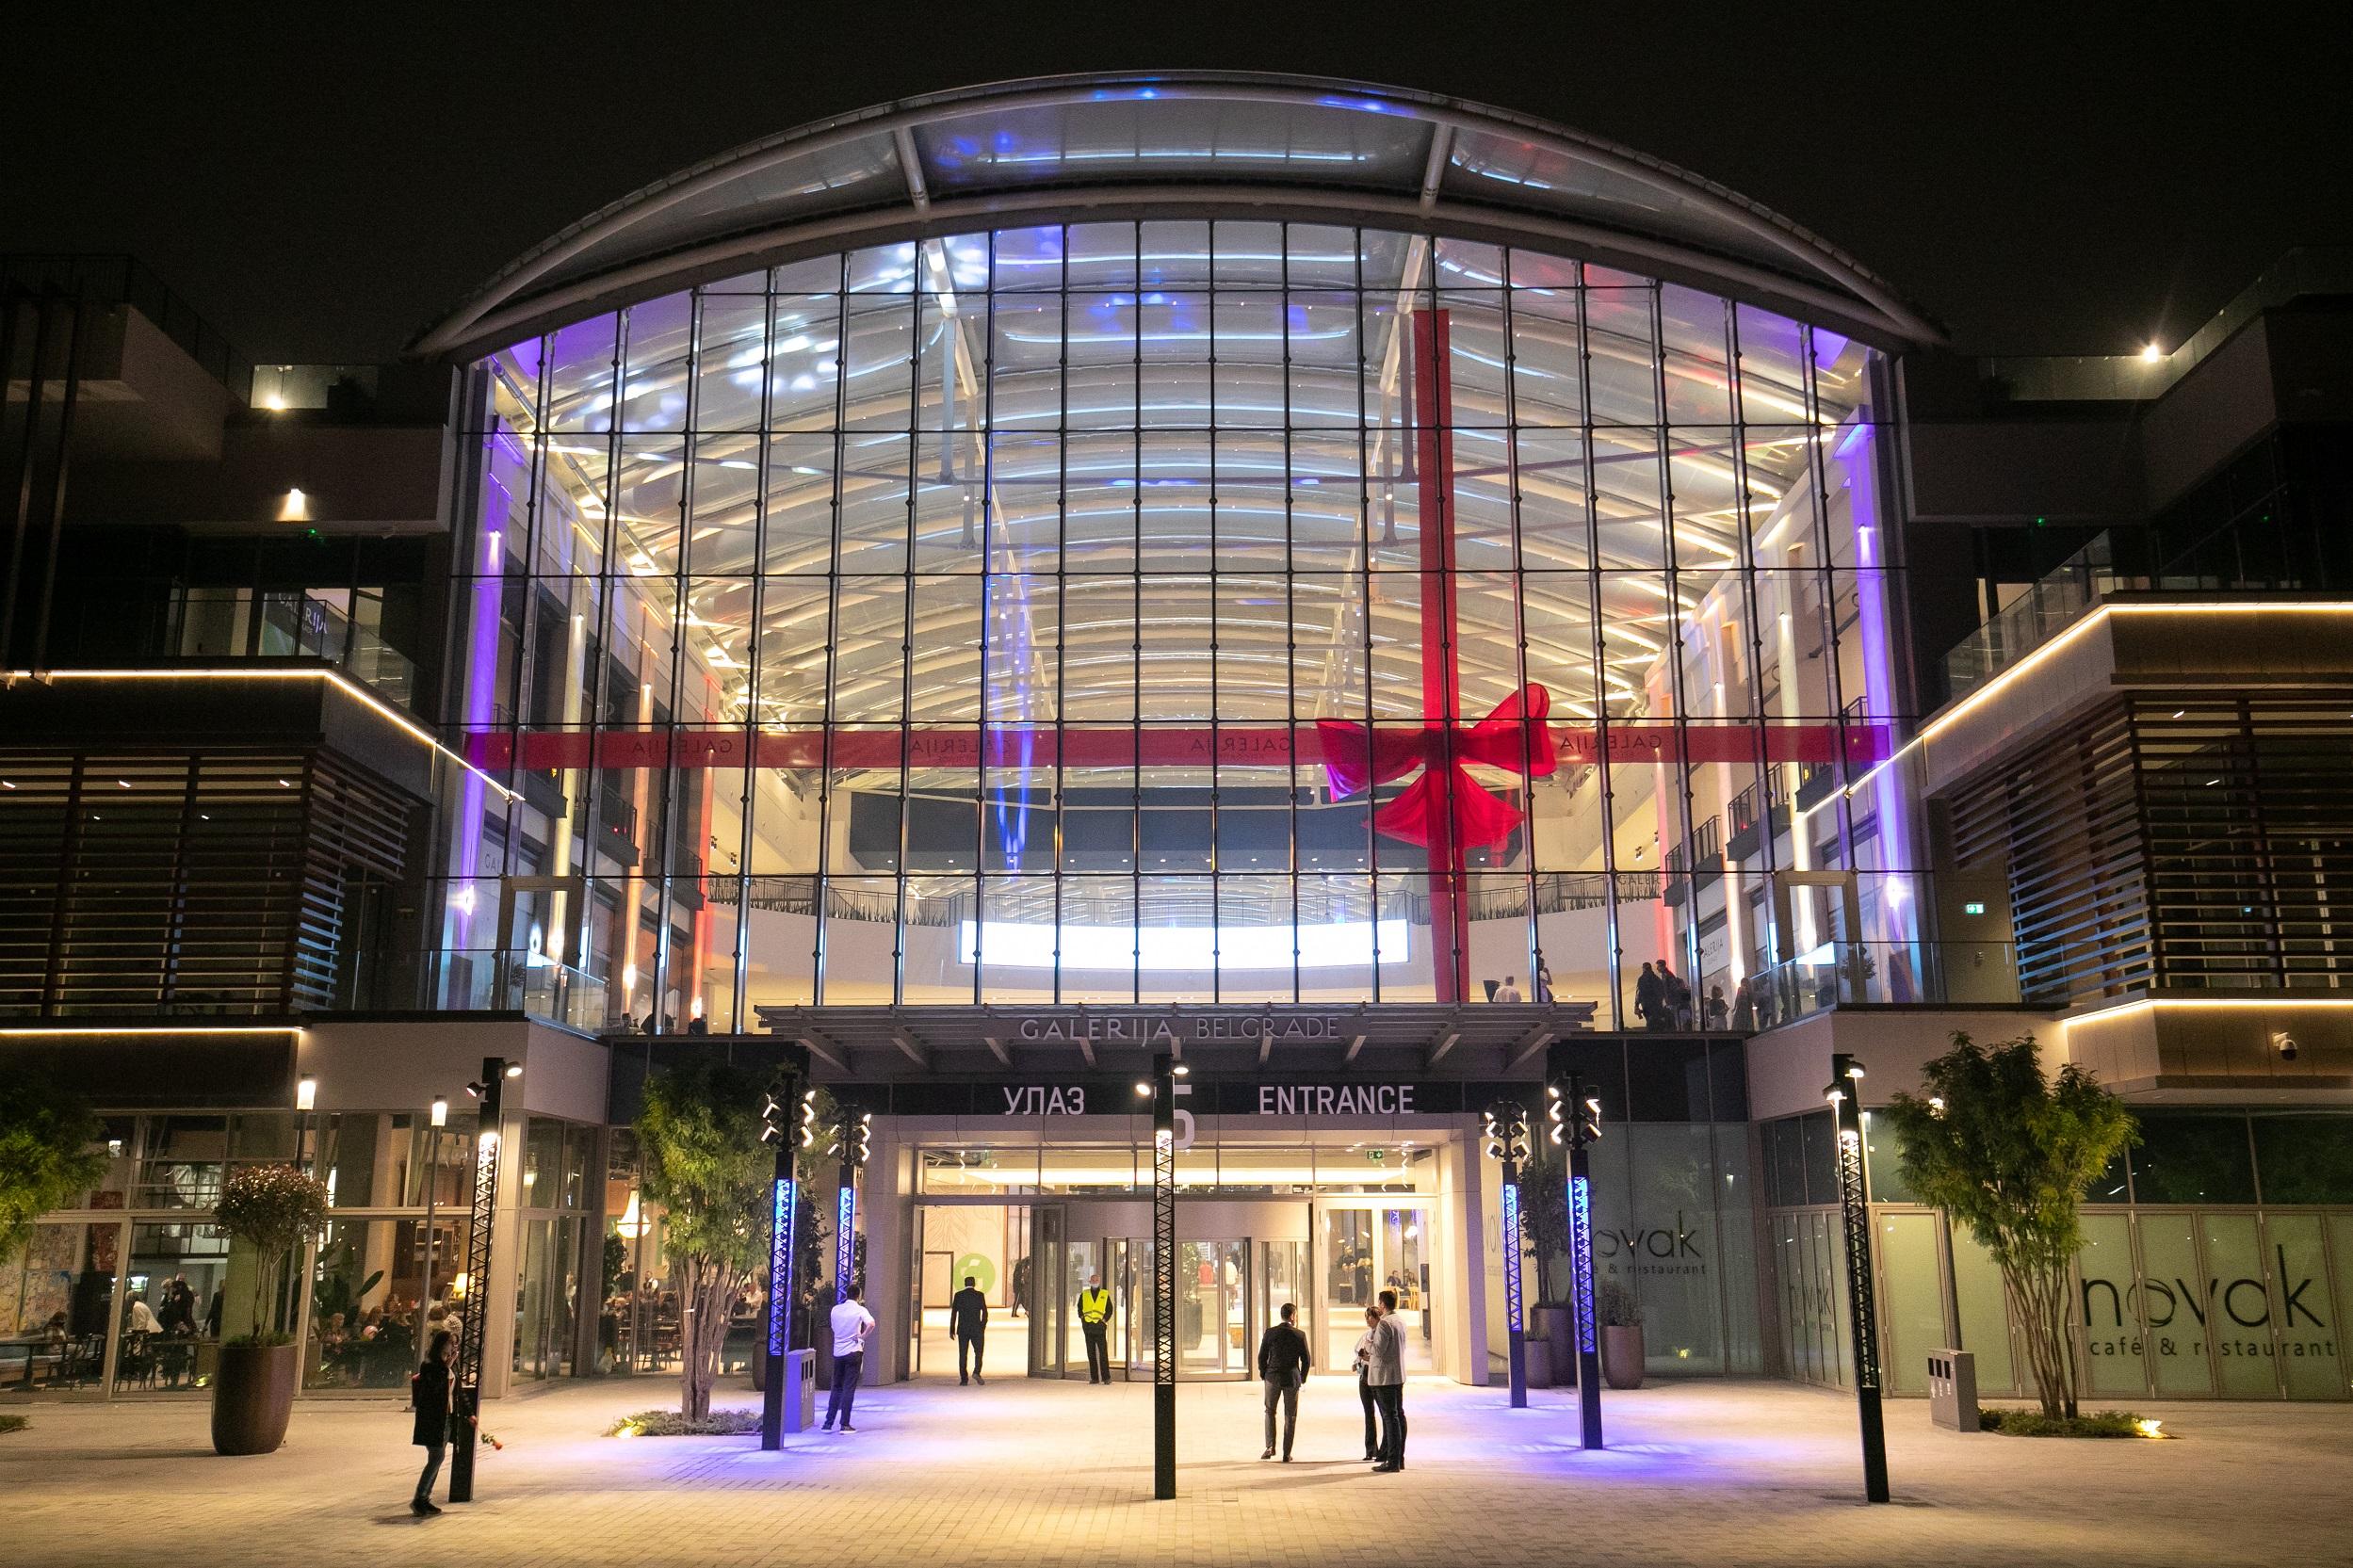 Go to Galeriji Belgrade nagrada za najbolji tržni centar